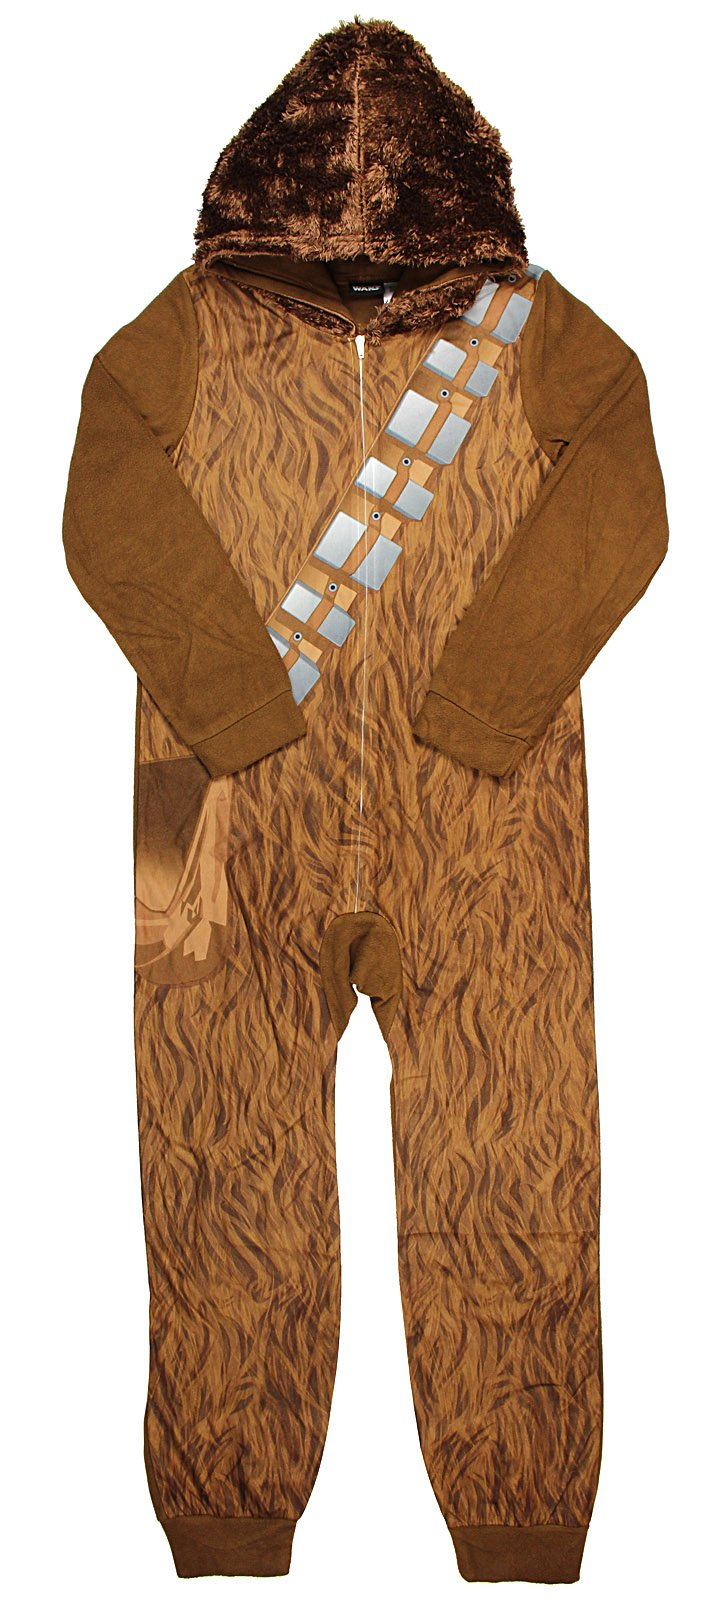 Boy's Star Wars Chewbacca Hooded Sleeper Pajama (X-Small 4/5)